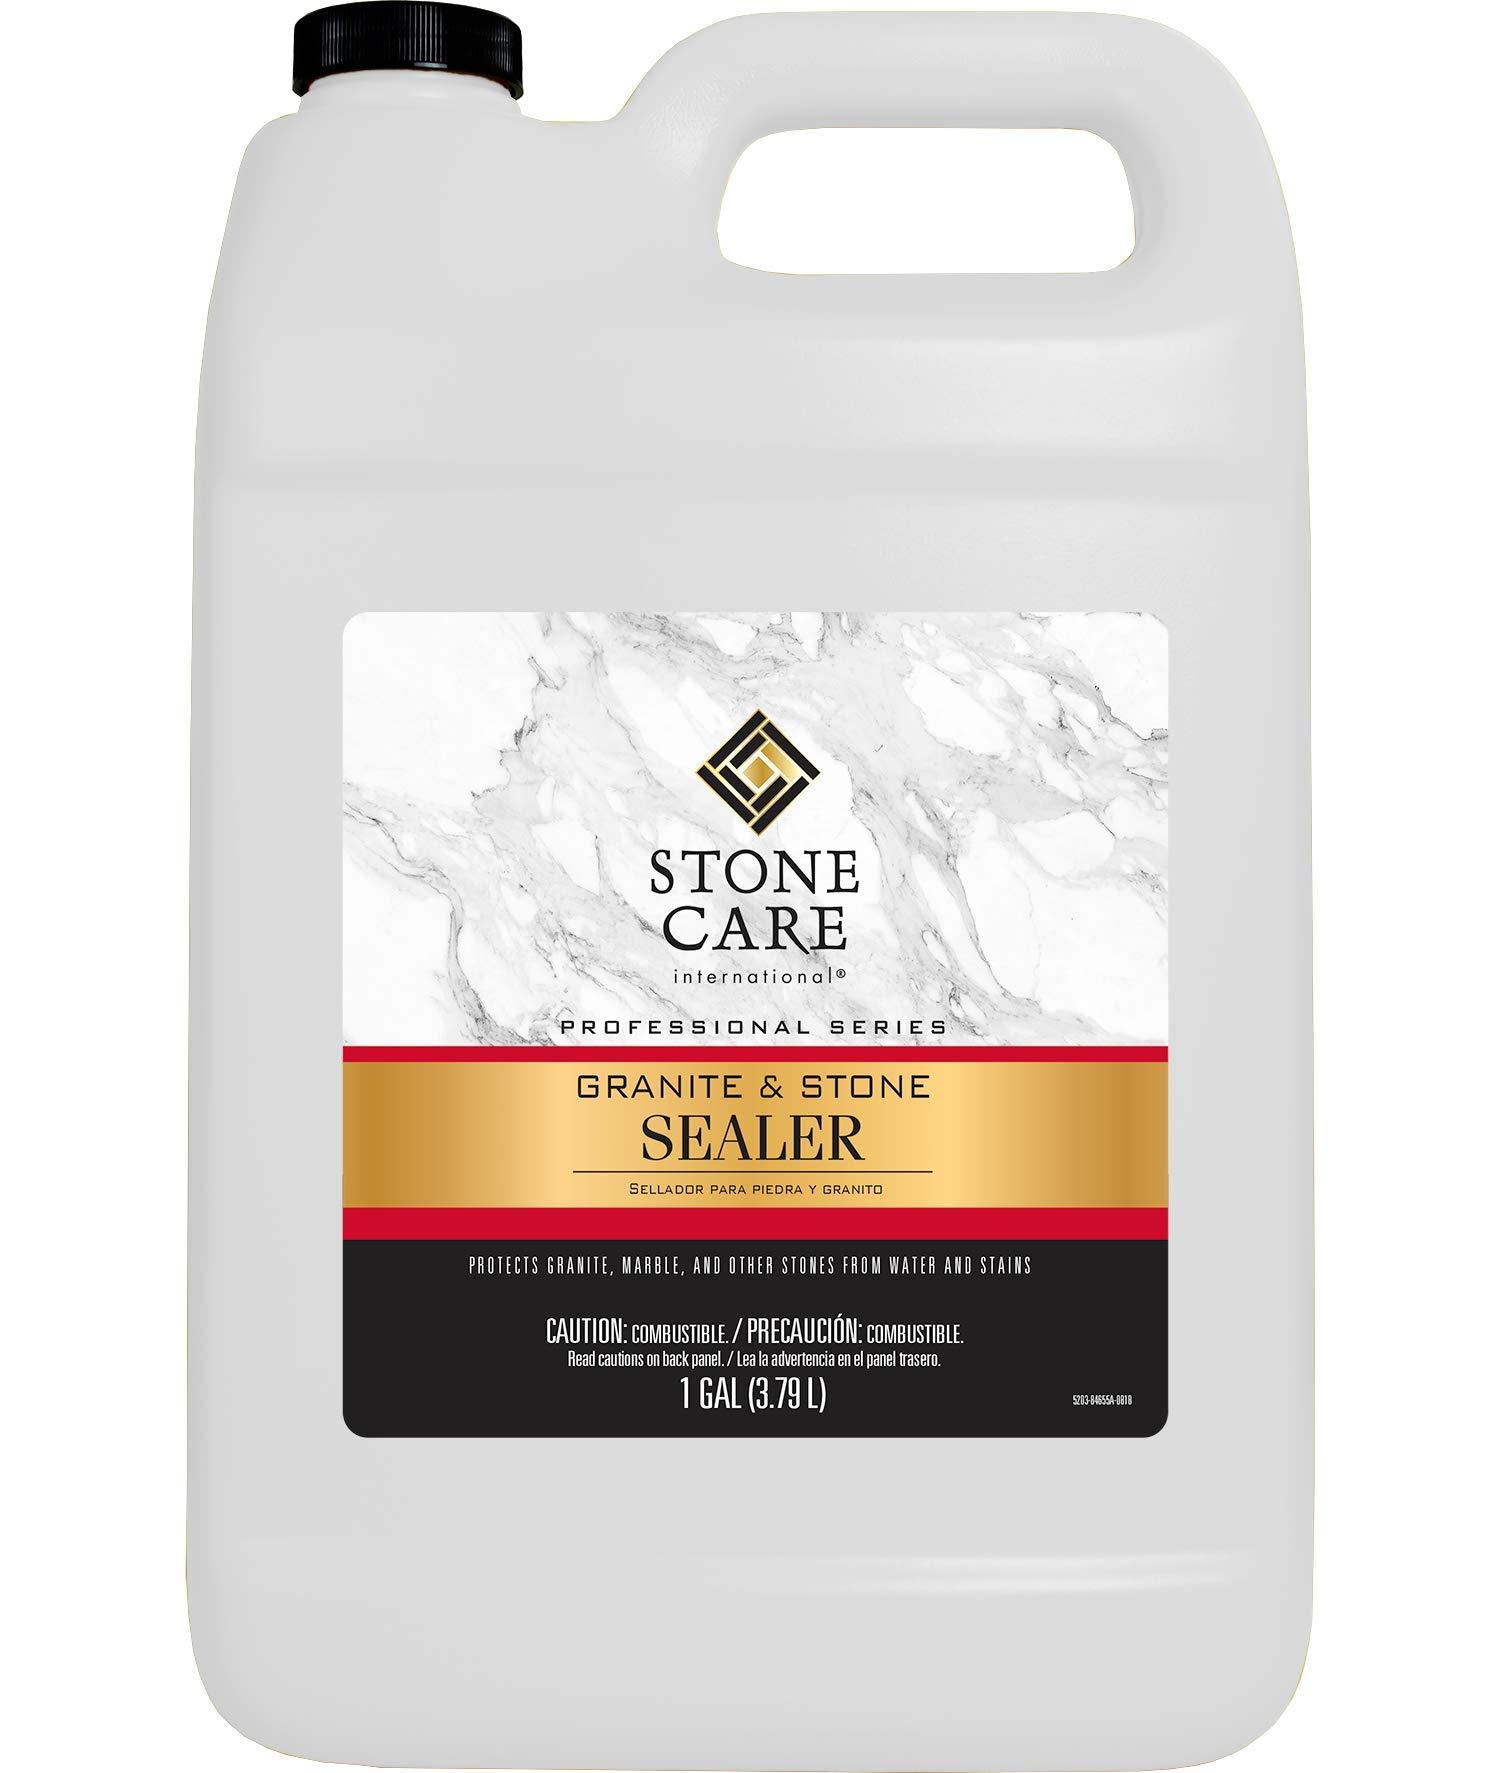 Stone Care International Professional Granite & Stone Sealer 128 fl oz [1 Gallon] - Protect Your Stone Marble Granite Travertine Limestone Countertop Fireplace Patio - Streak Free